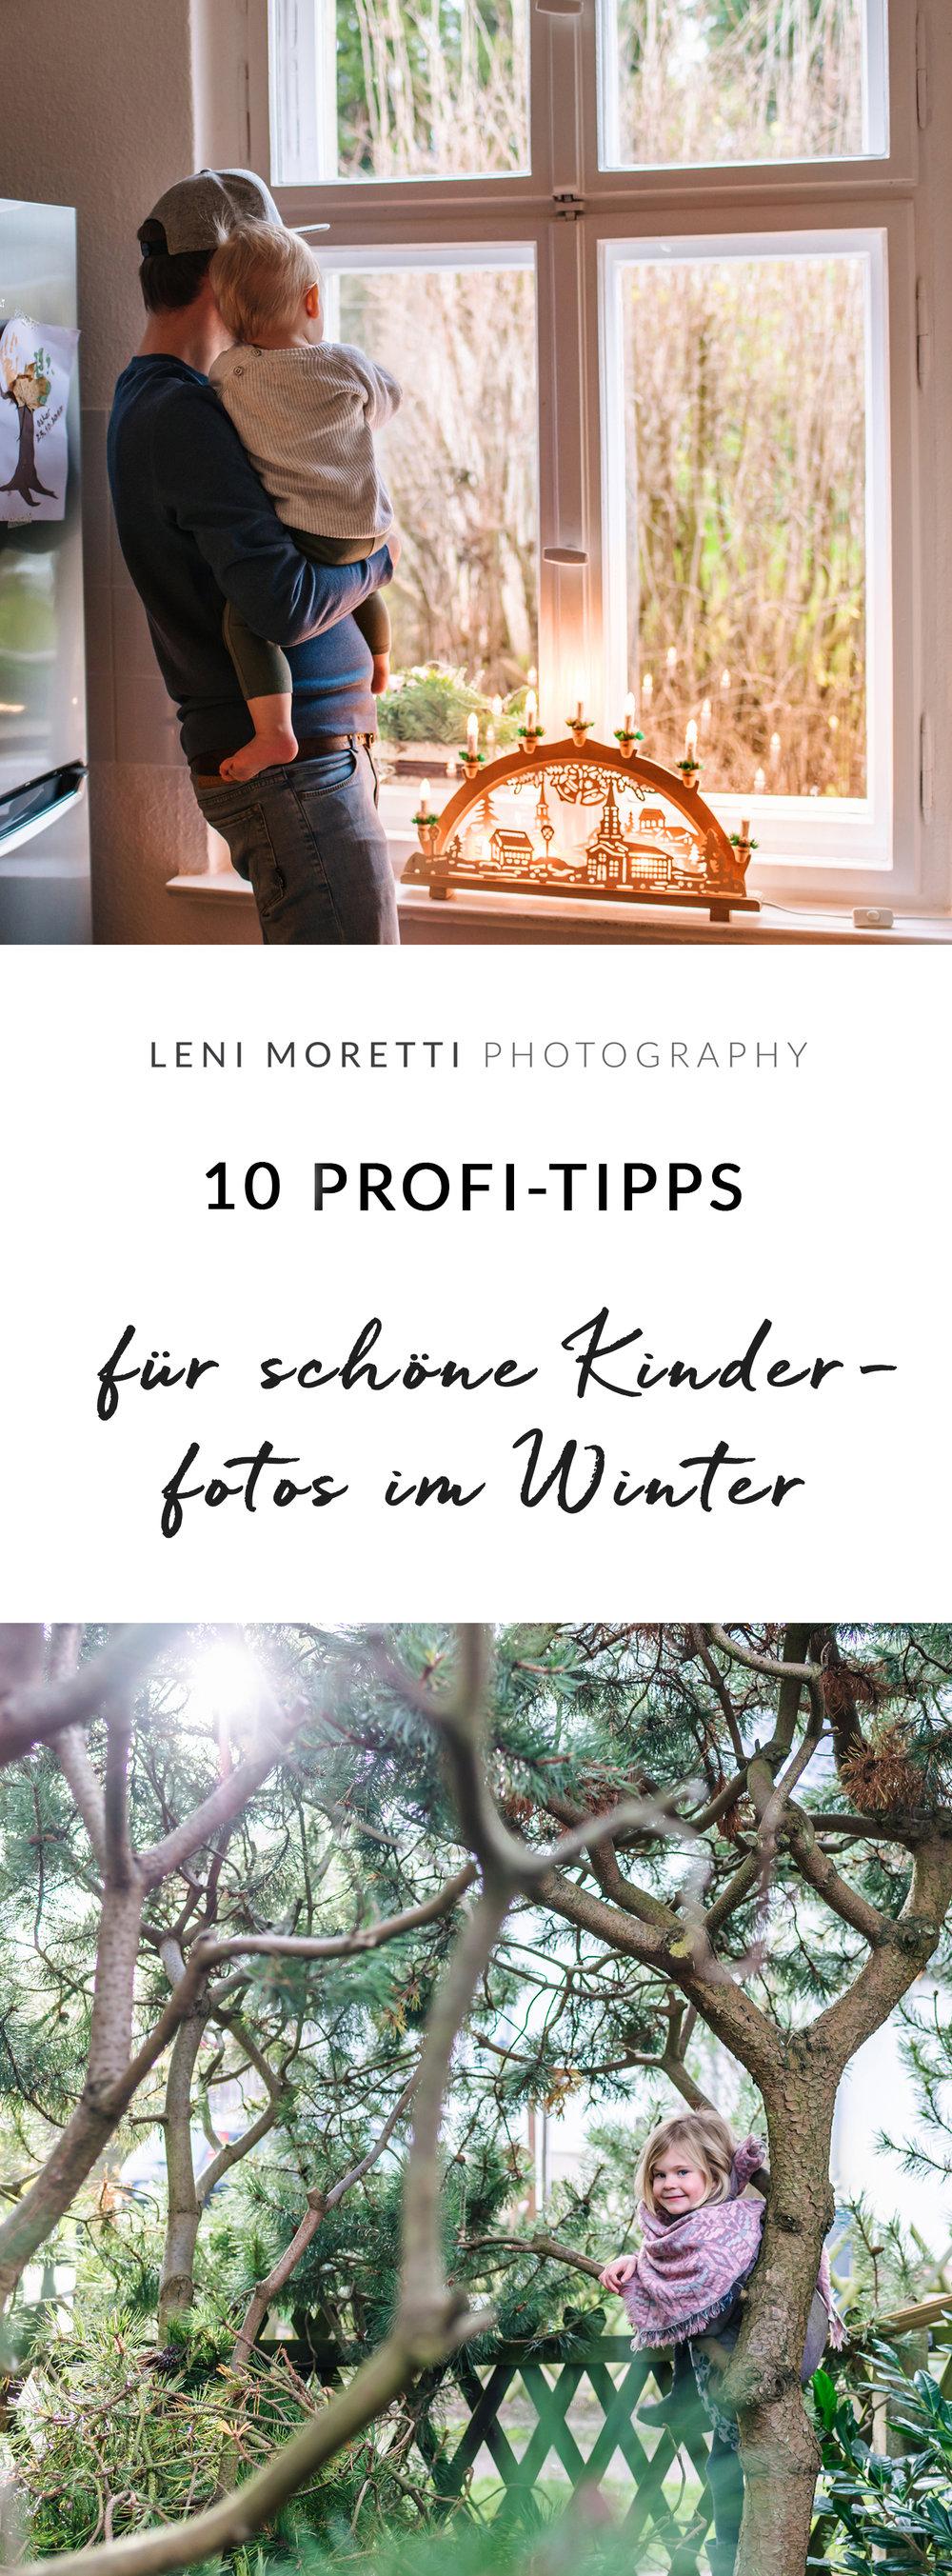 5 Profi-Tipps für Kinderfotos im Winter. Pin mich! © lenimoretti.com